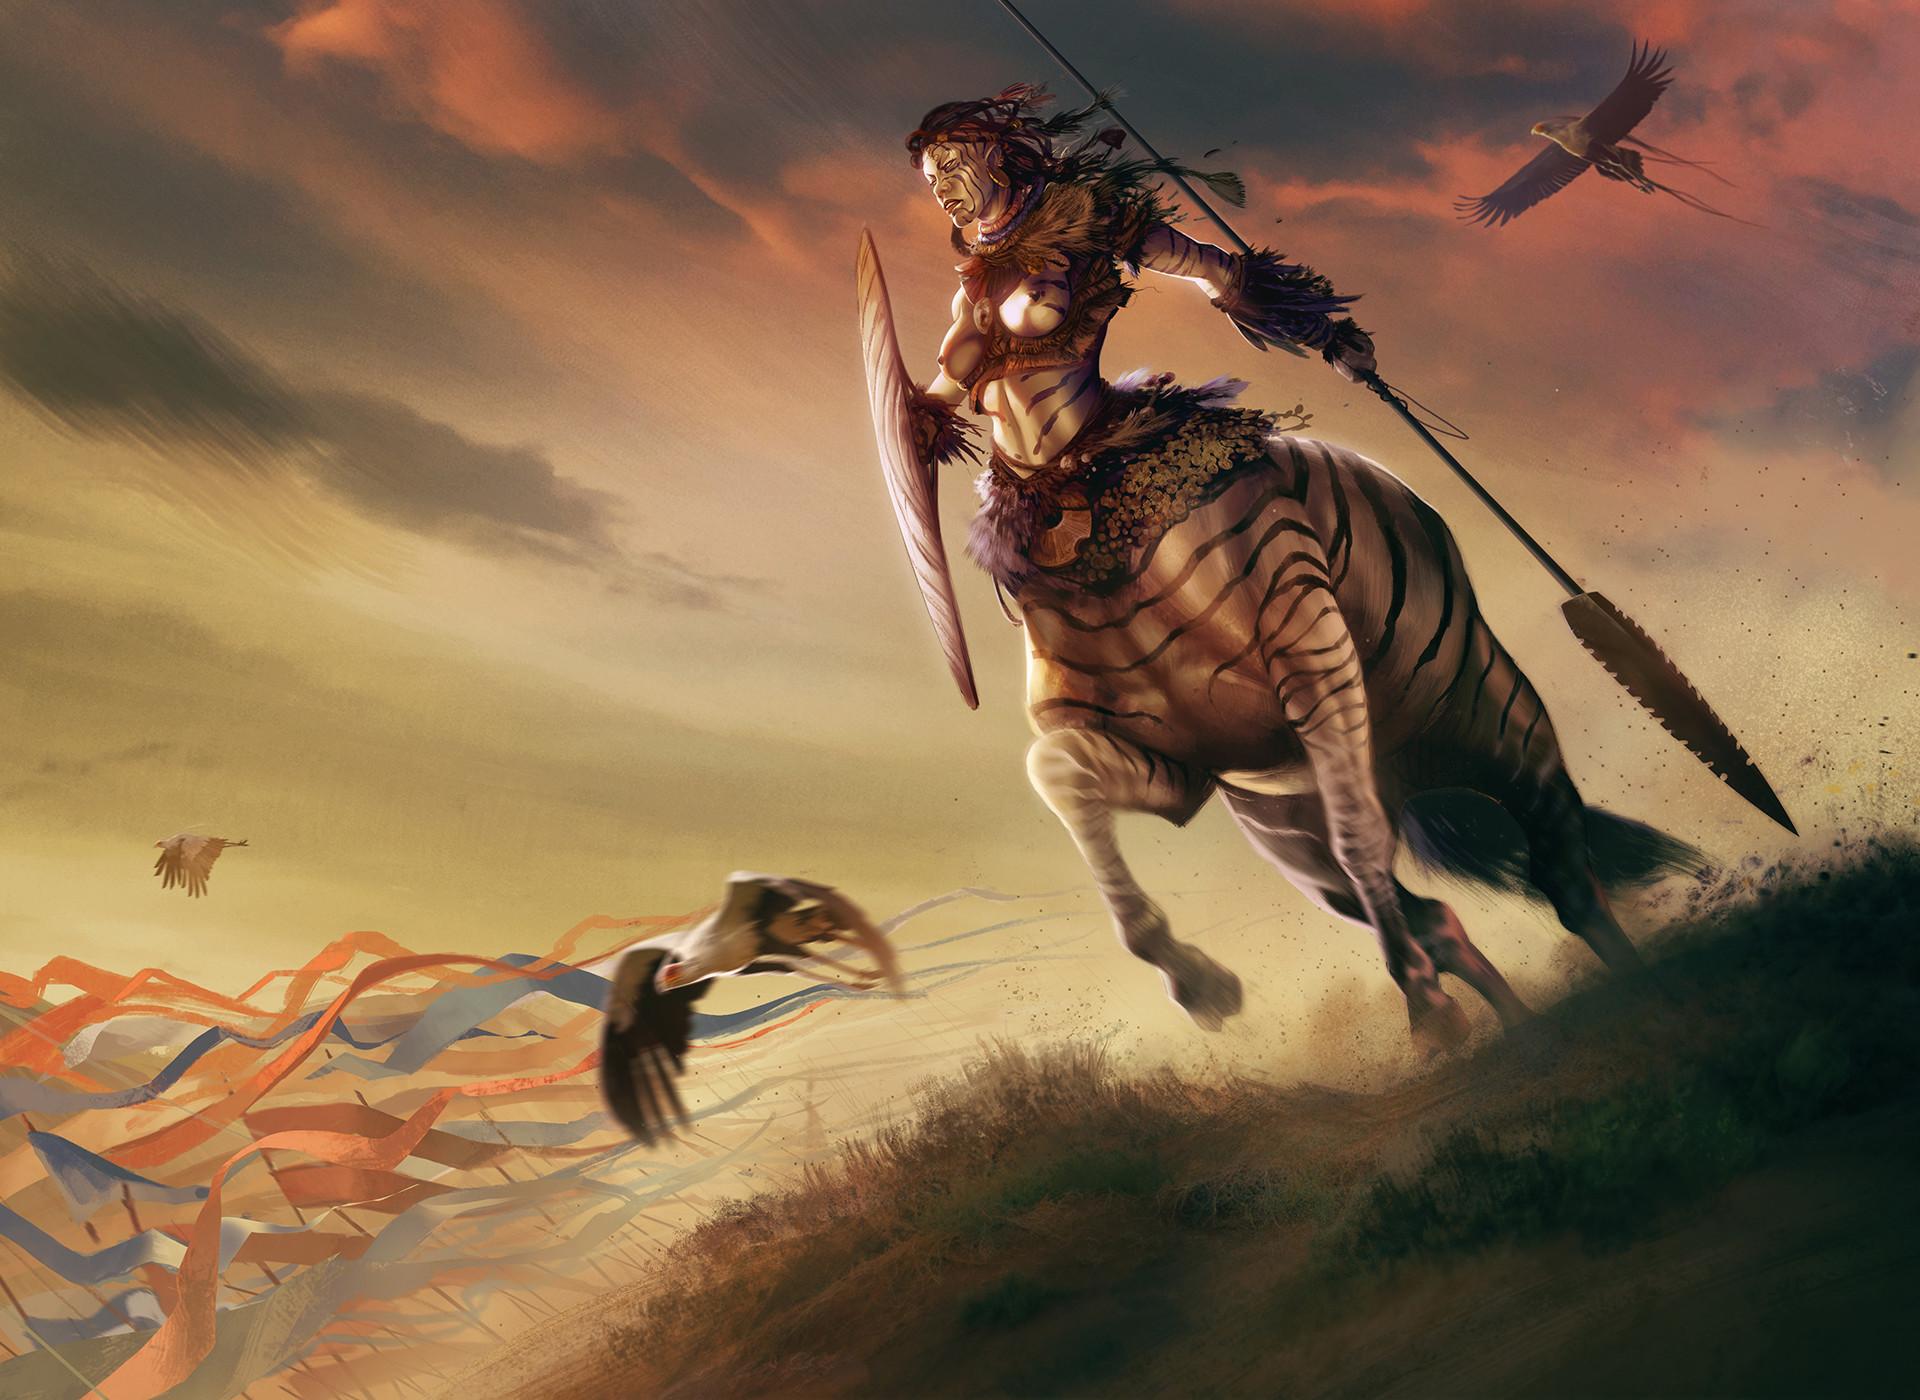 David alvarez mtg centaure ld